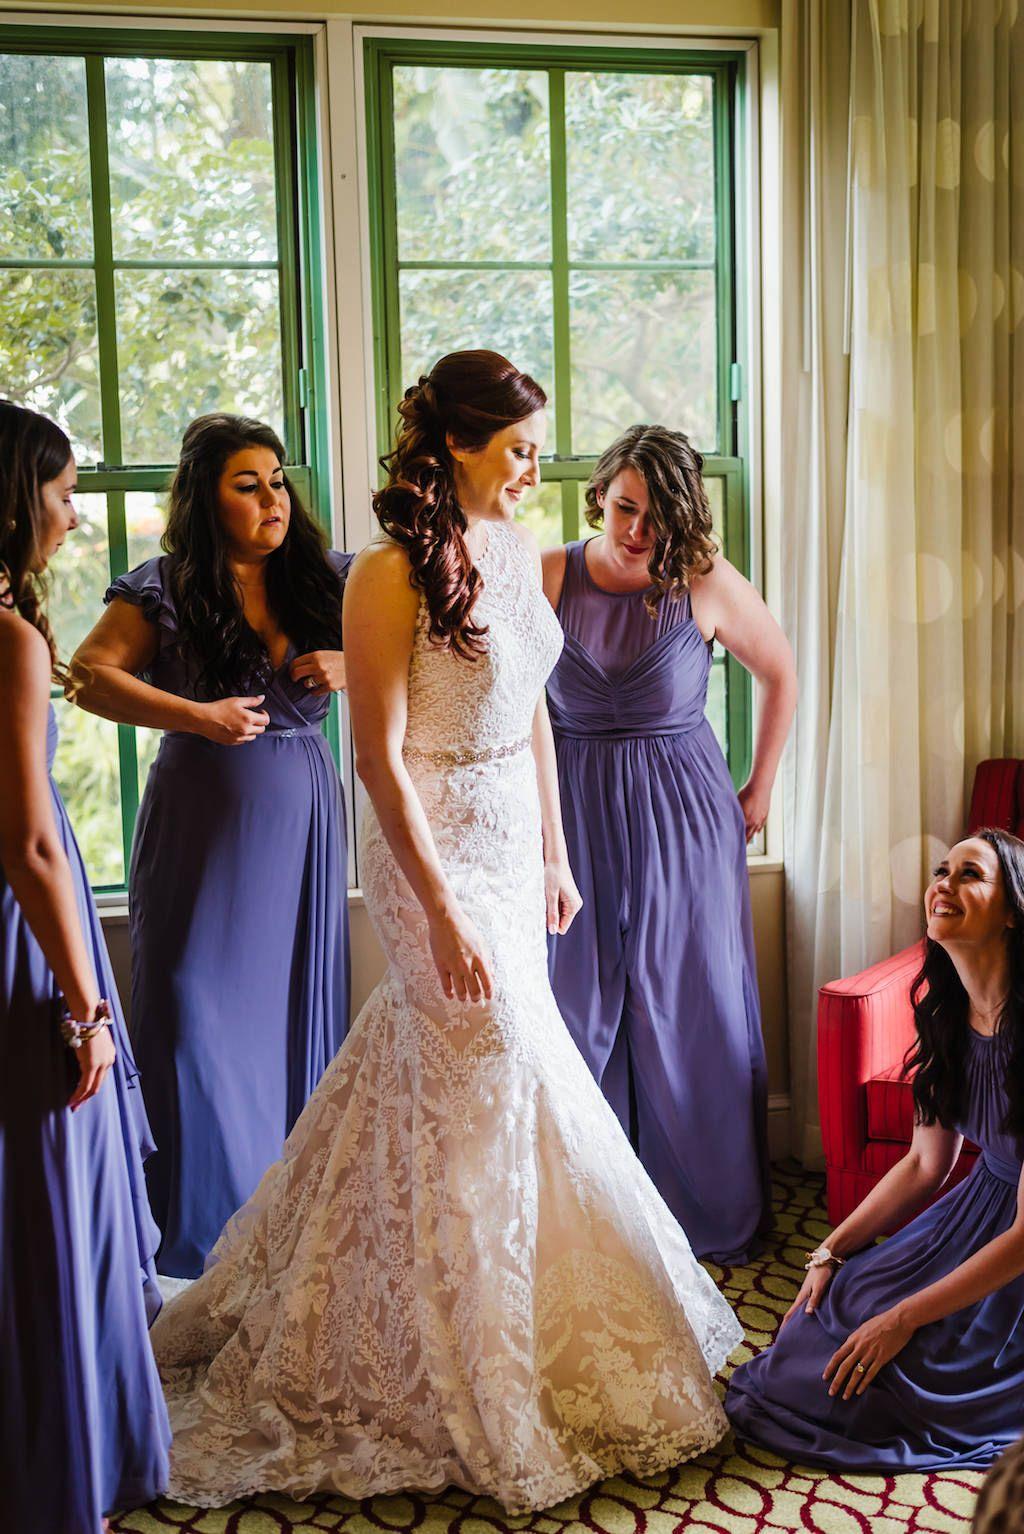 Bride Getting Ready Portrait, Bridesmaids in Dusty Purple Dessy Dresses, Bride in Belted Trumpet Eddy K Lace Wedding Dress